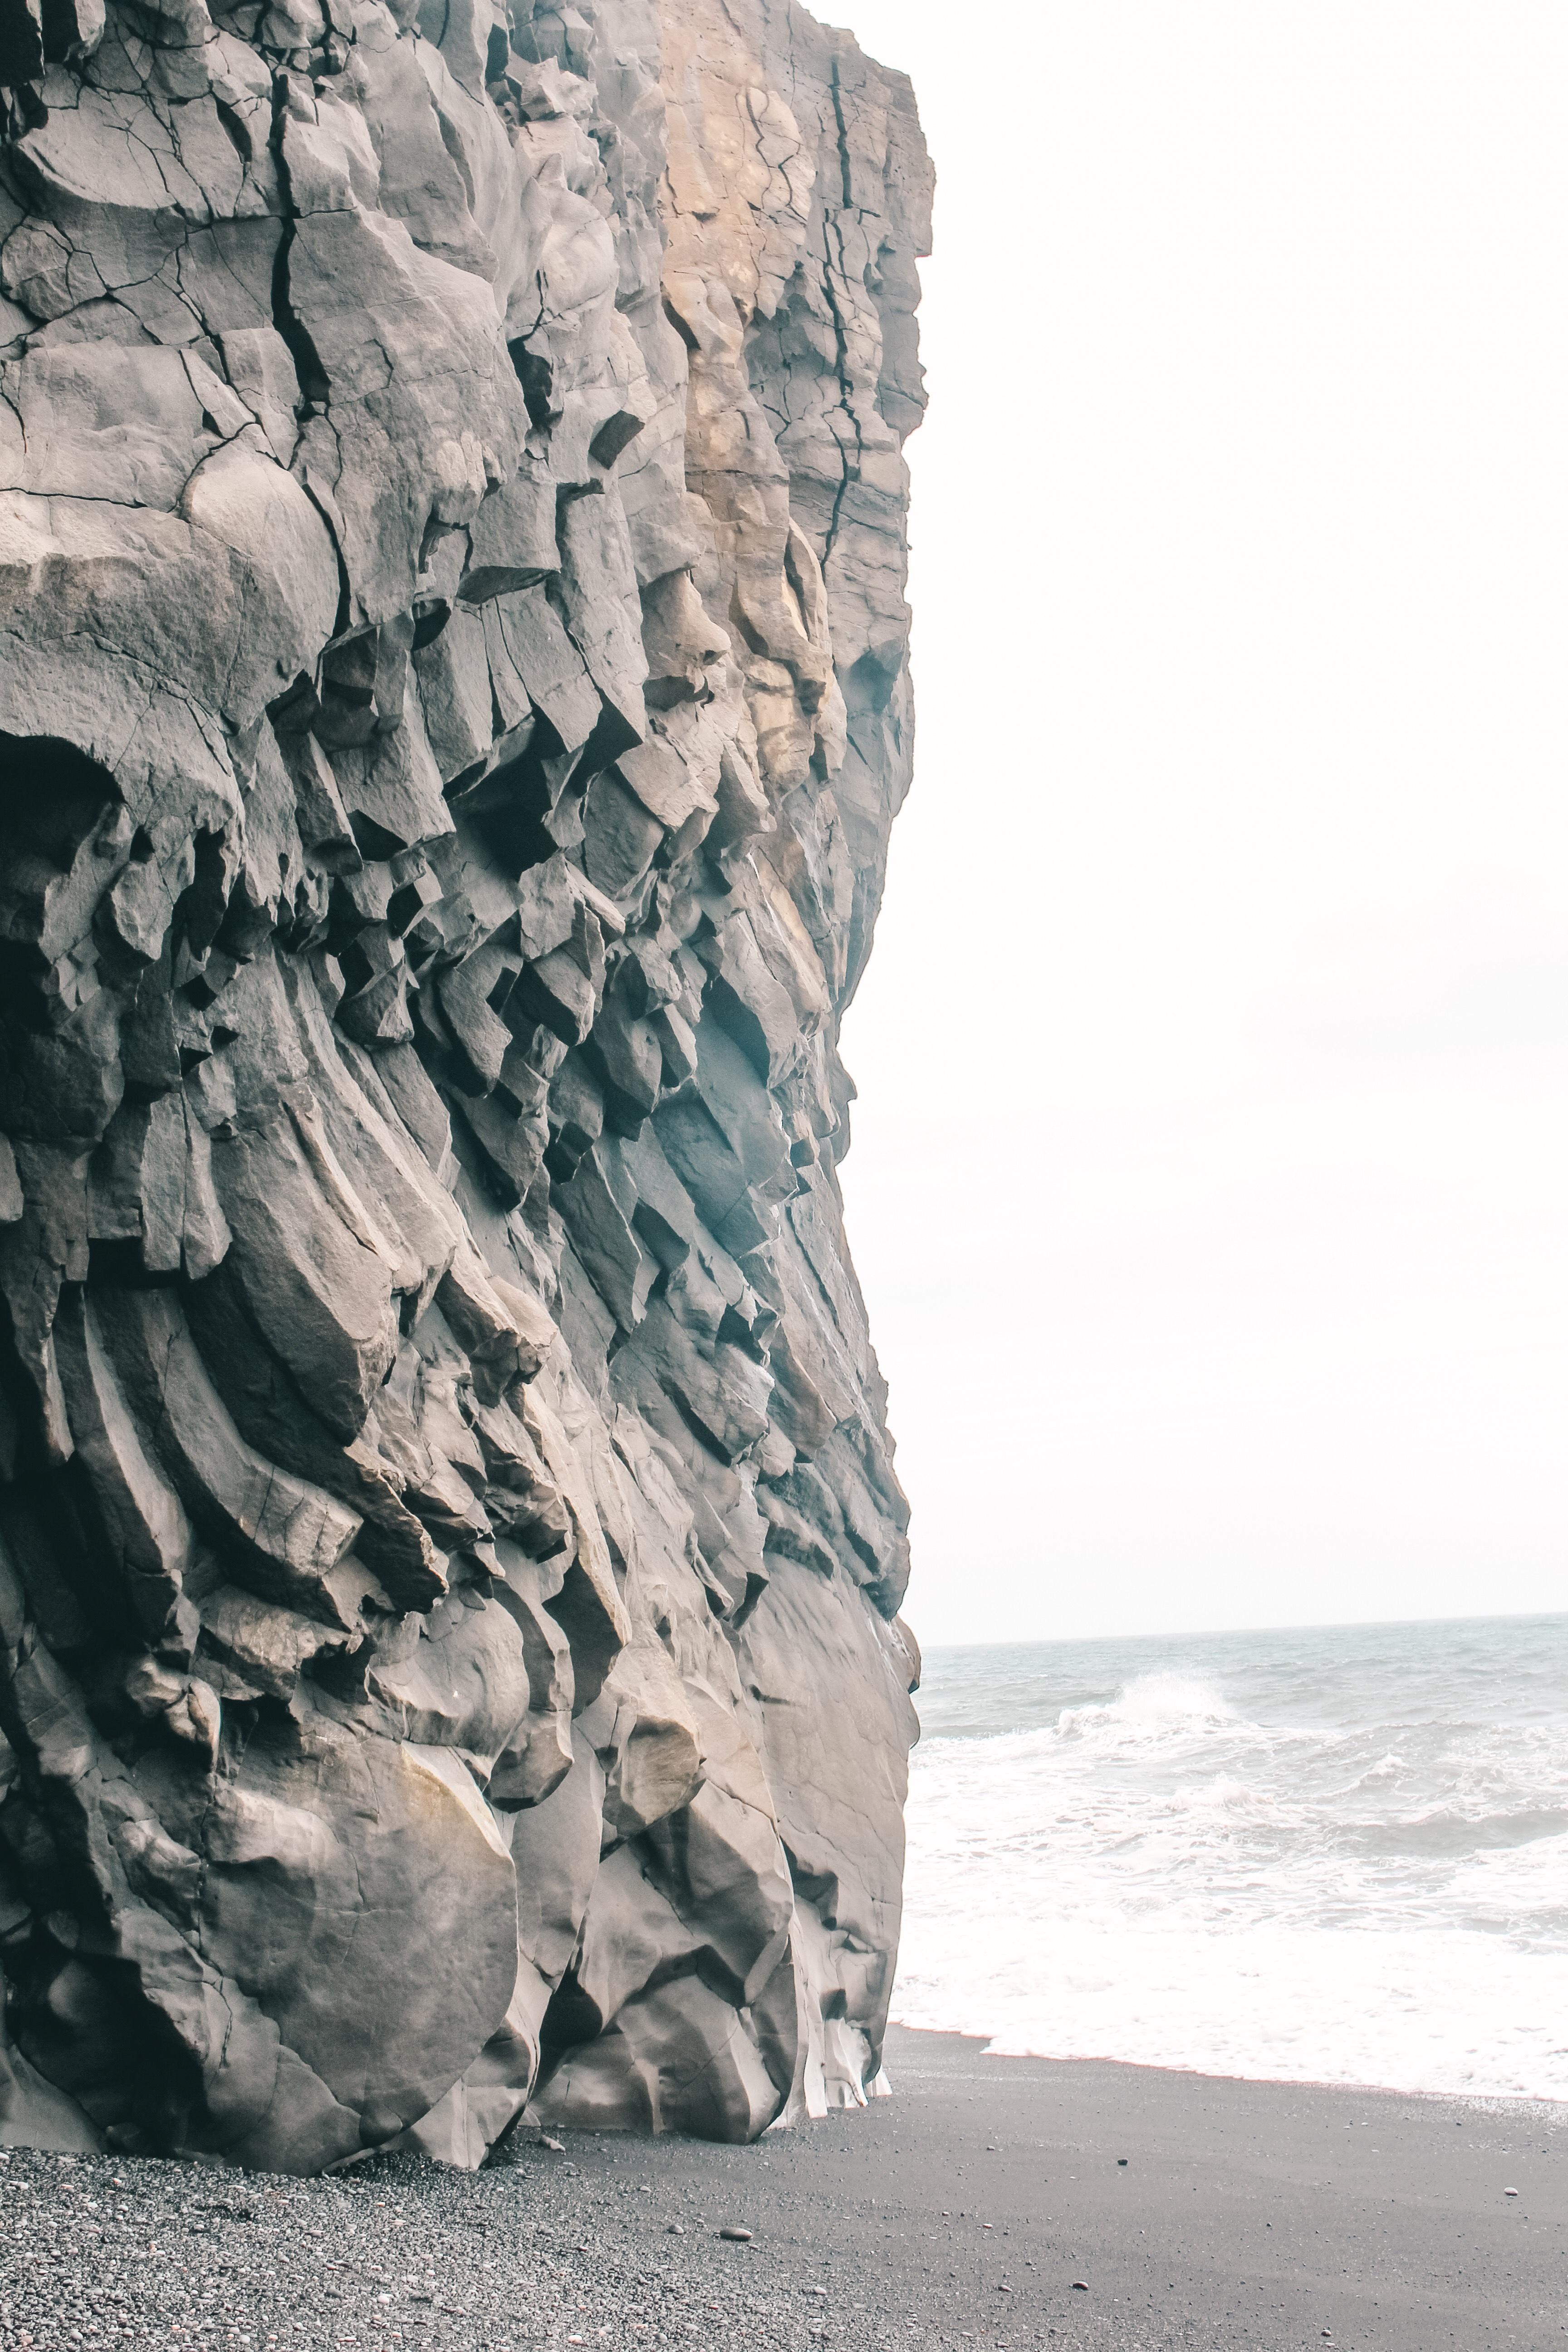 Kikjufjara Strand Island Dyrholaey